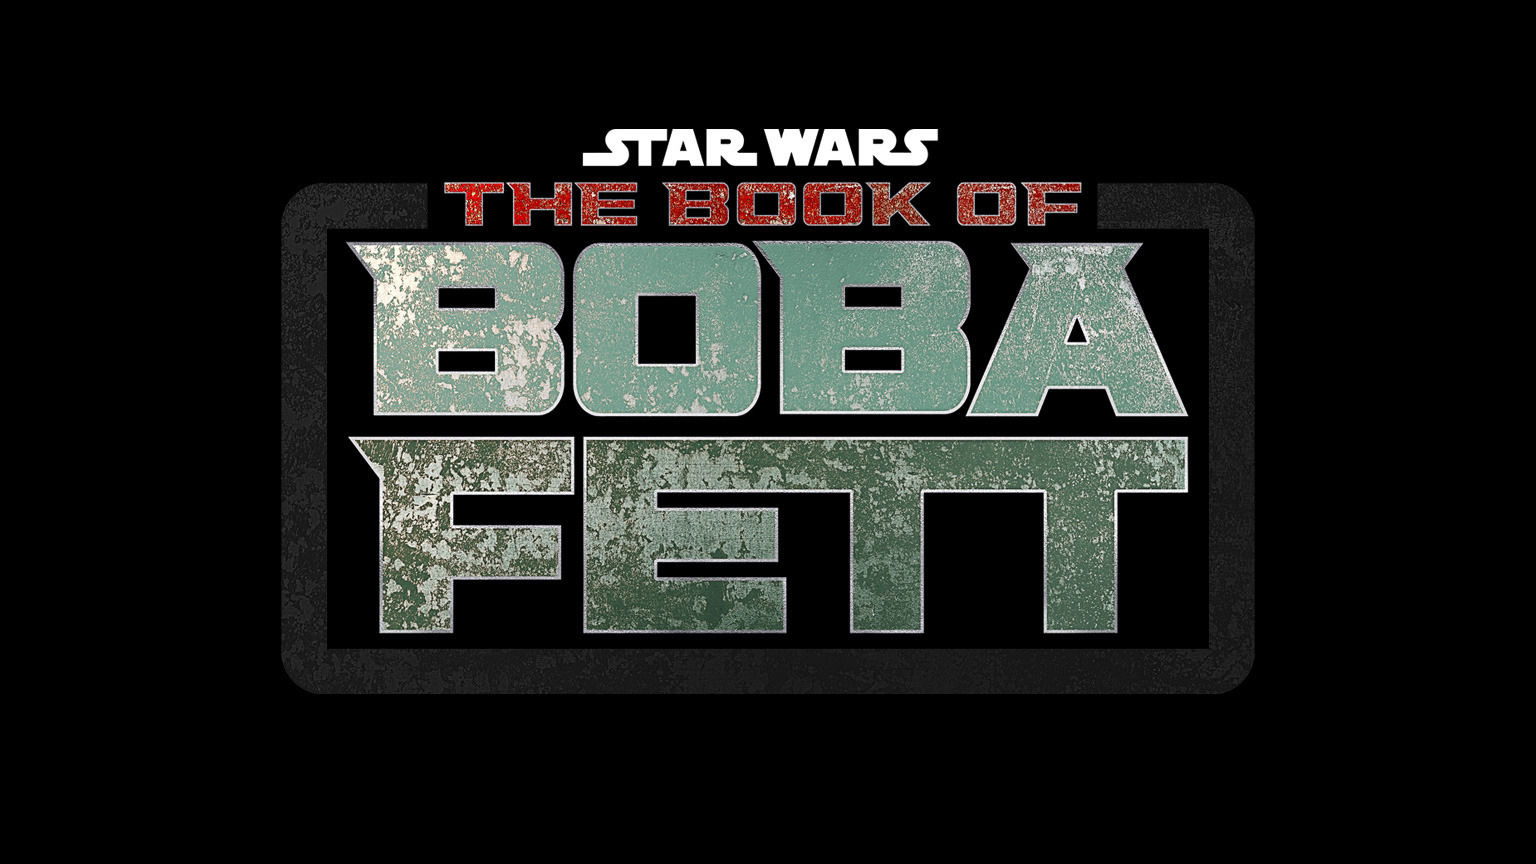 Show The Book of Boba Fett